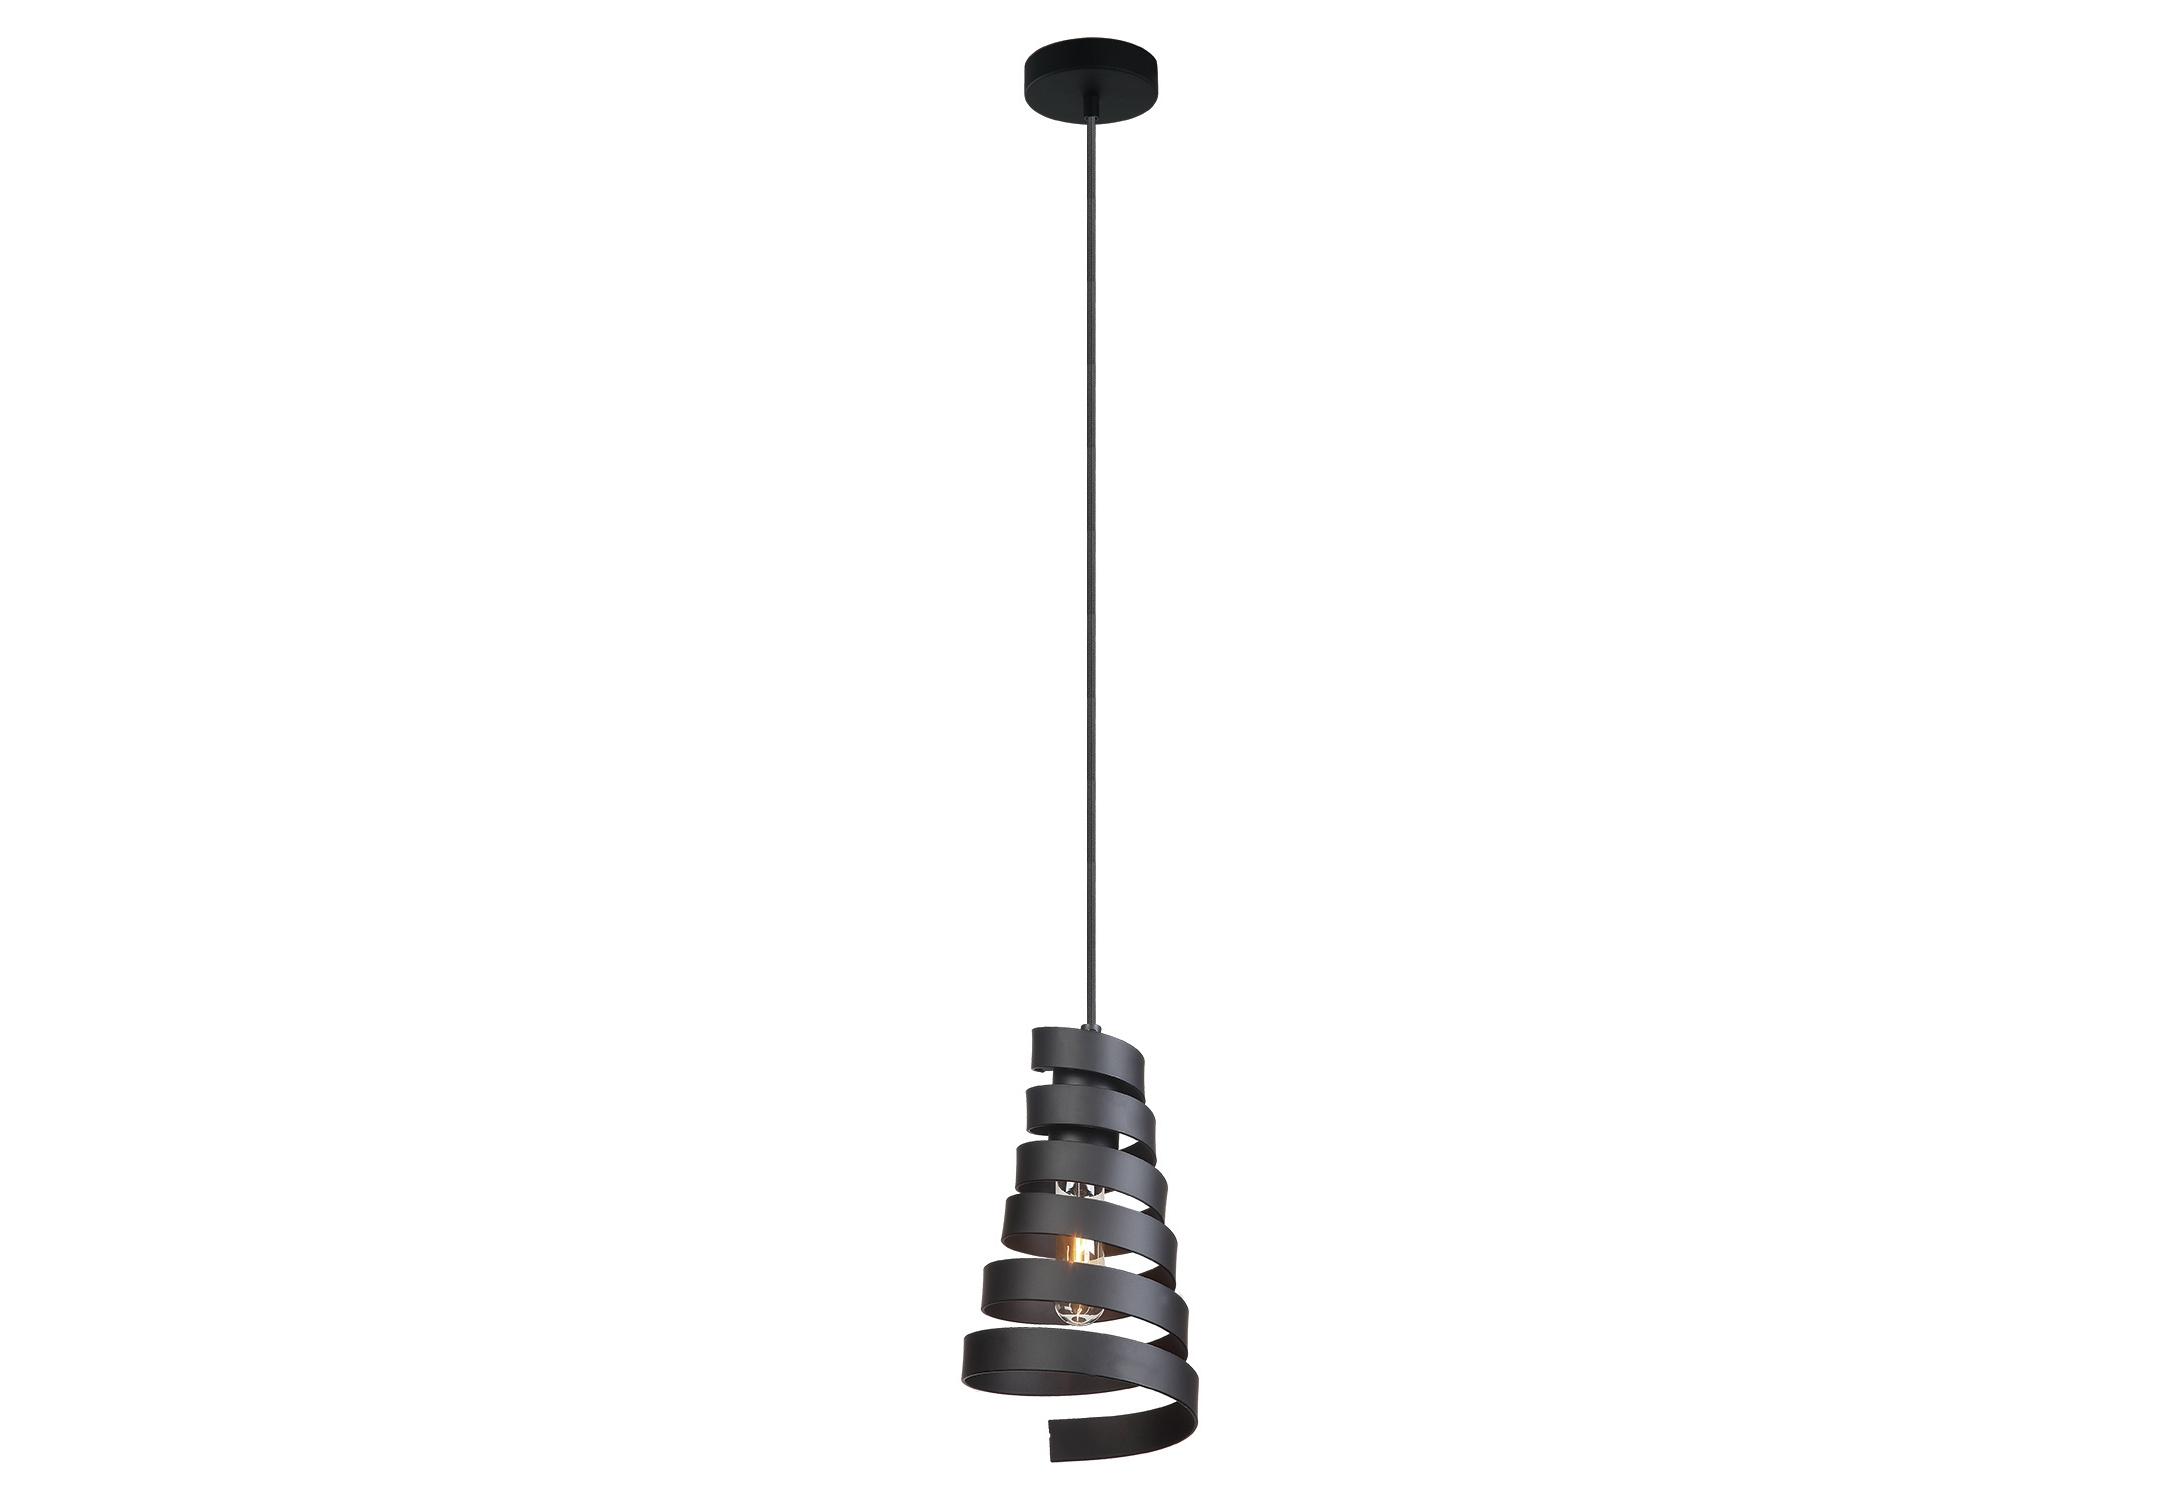 Подвесной светильникПодвесные светильники<br>&amp;lt;div&amp;gt;Цоколь: E27&amp;lt;/div&amp;gt;&amp;lt;div&amp;gt;Мощность ламп: 60W&amp;lt;/div&amp;gt;&amp;lt;div&amp;gt;Количество лампочек: 1&amp;lt;/div&amp;gt;<br><br>Material: Металл<br>Height см: 140<br>Diameter см: 28